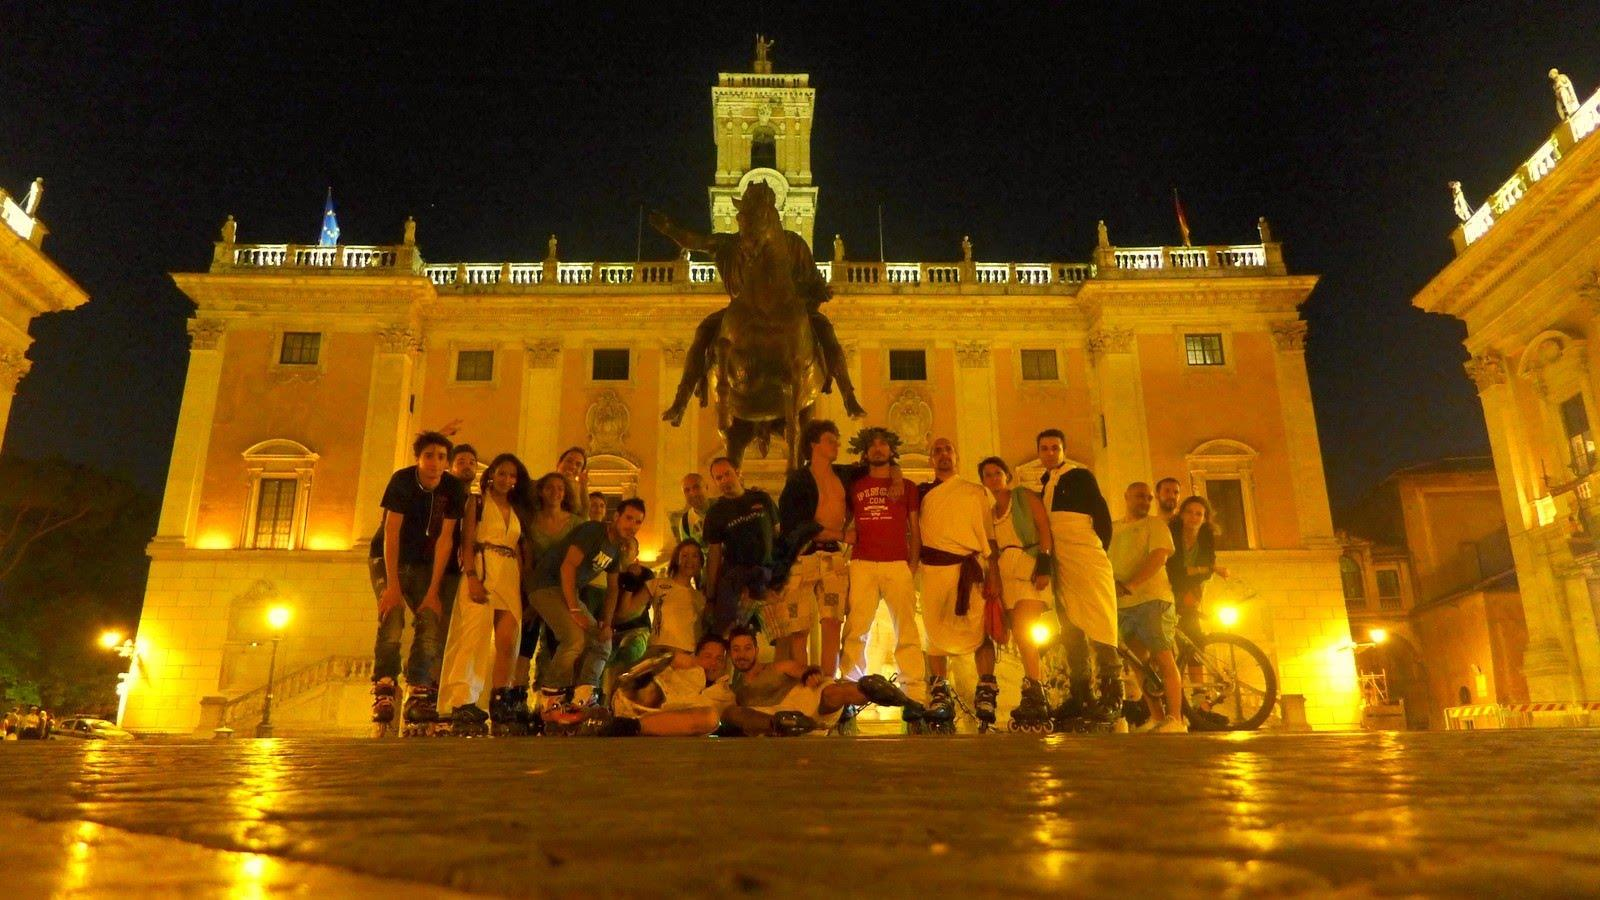 Wednesday Night Skate 2013 – ROMA Toga Roller